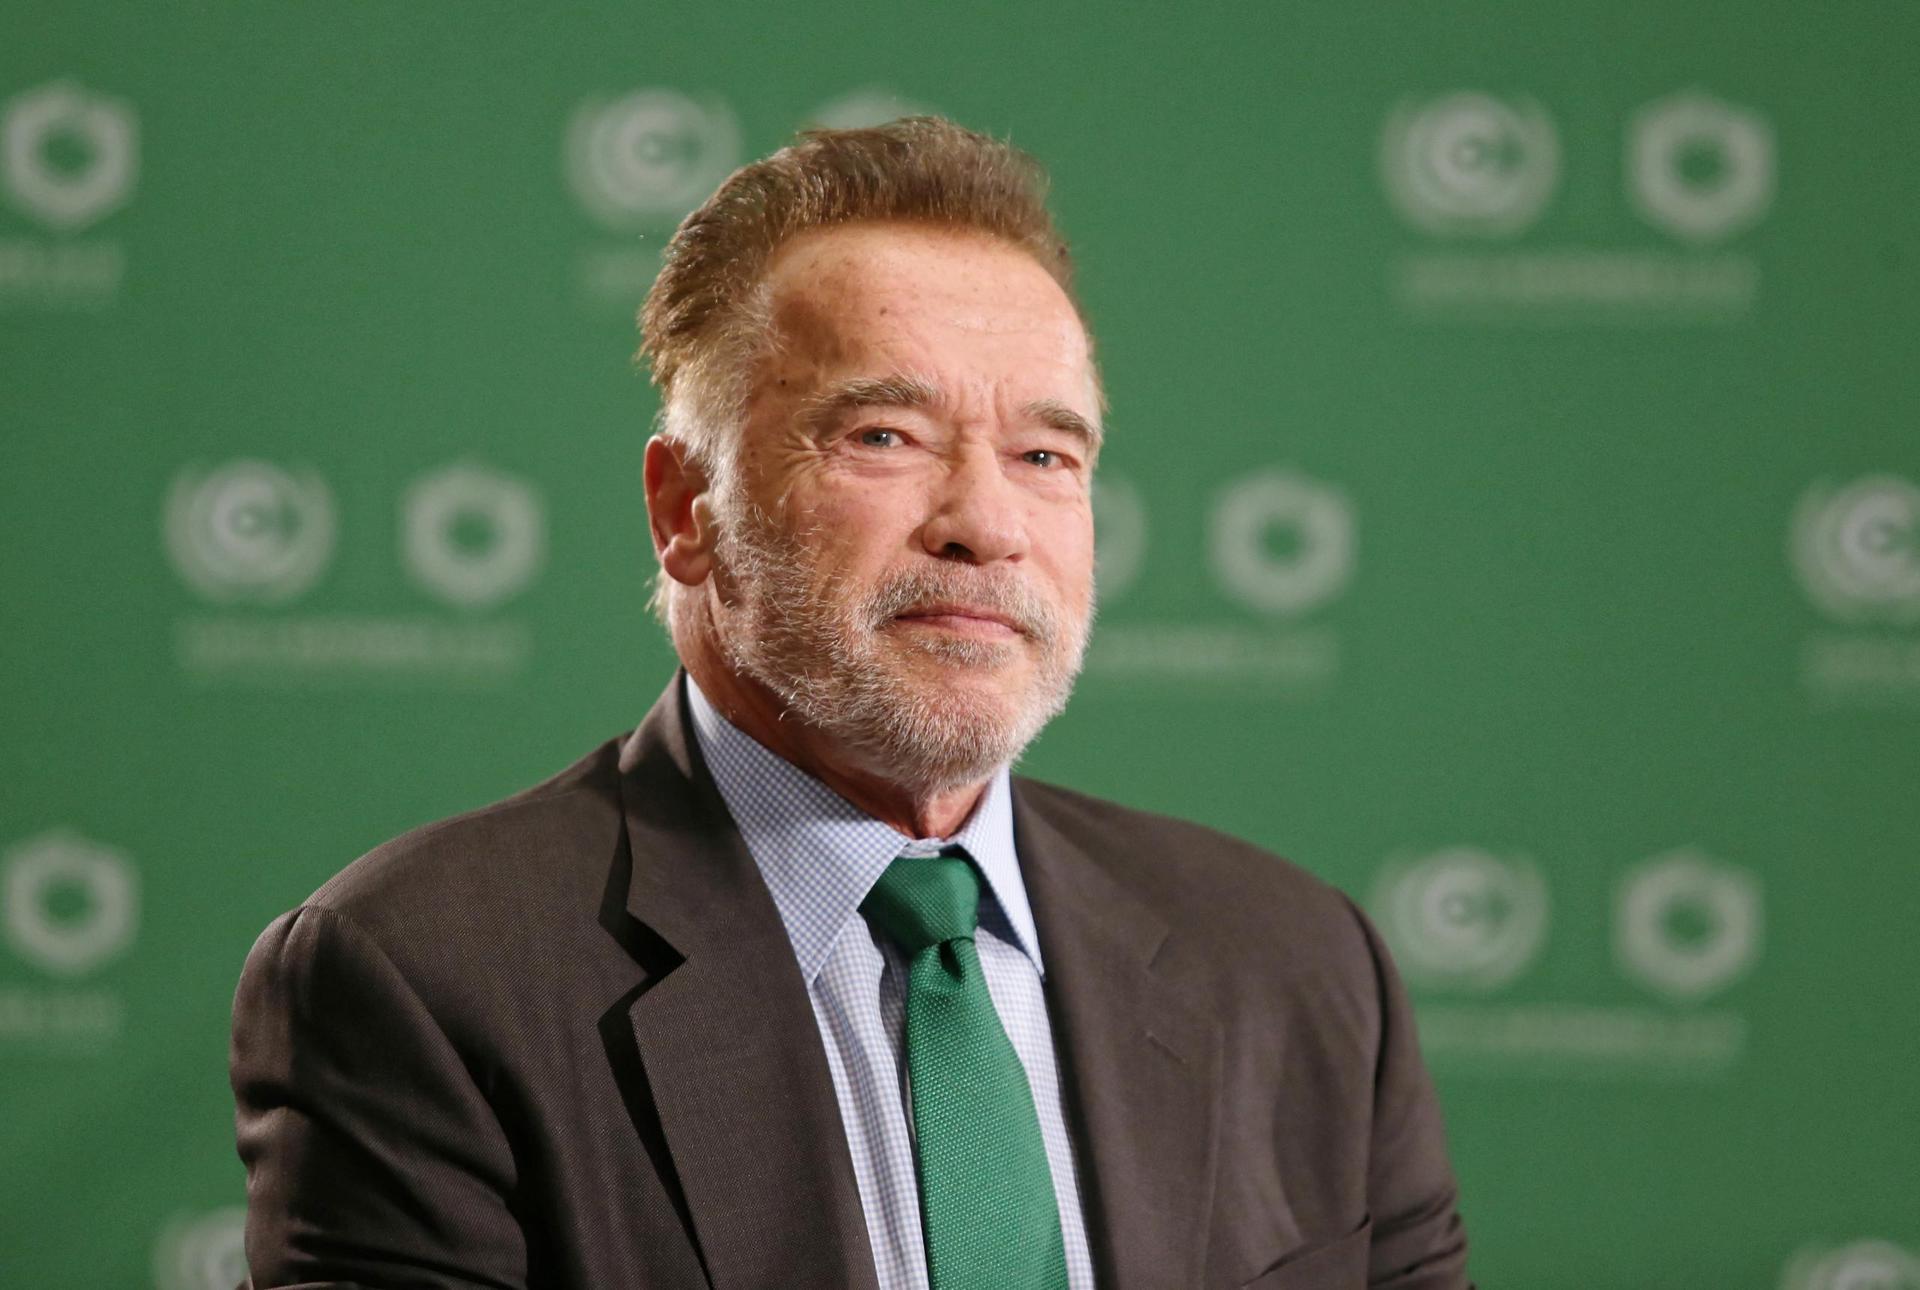 Arnold Schwarzenegger gegen Covid-19 geimpft Pandemie